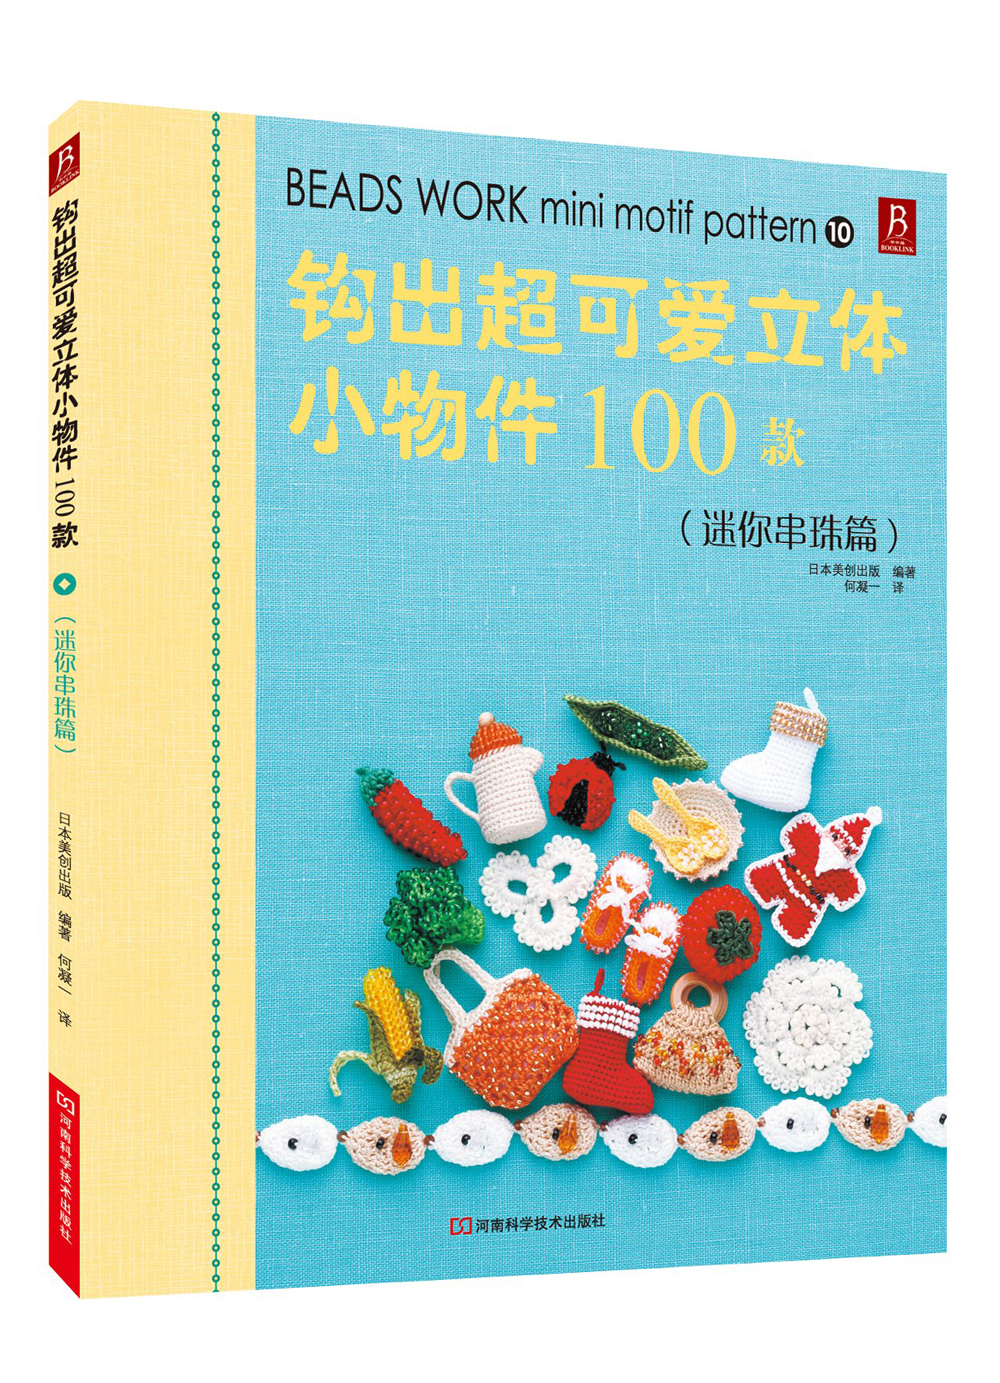 Beads Work Mini Motif Pattern / Weaving Super-cute 3d Small Objects 100 Models Chinese Knitting Book / 3D Handmade Carft Book